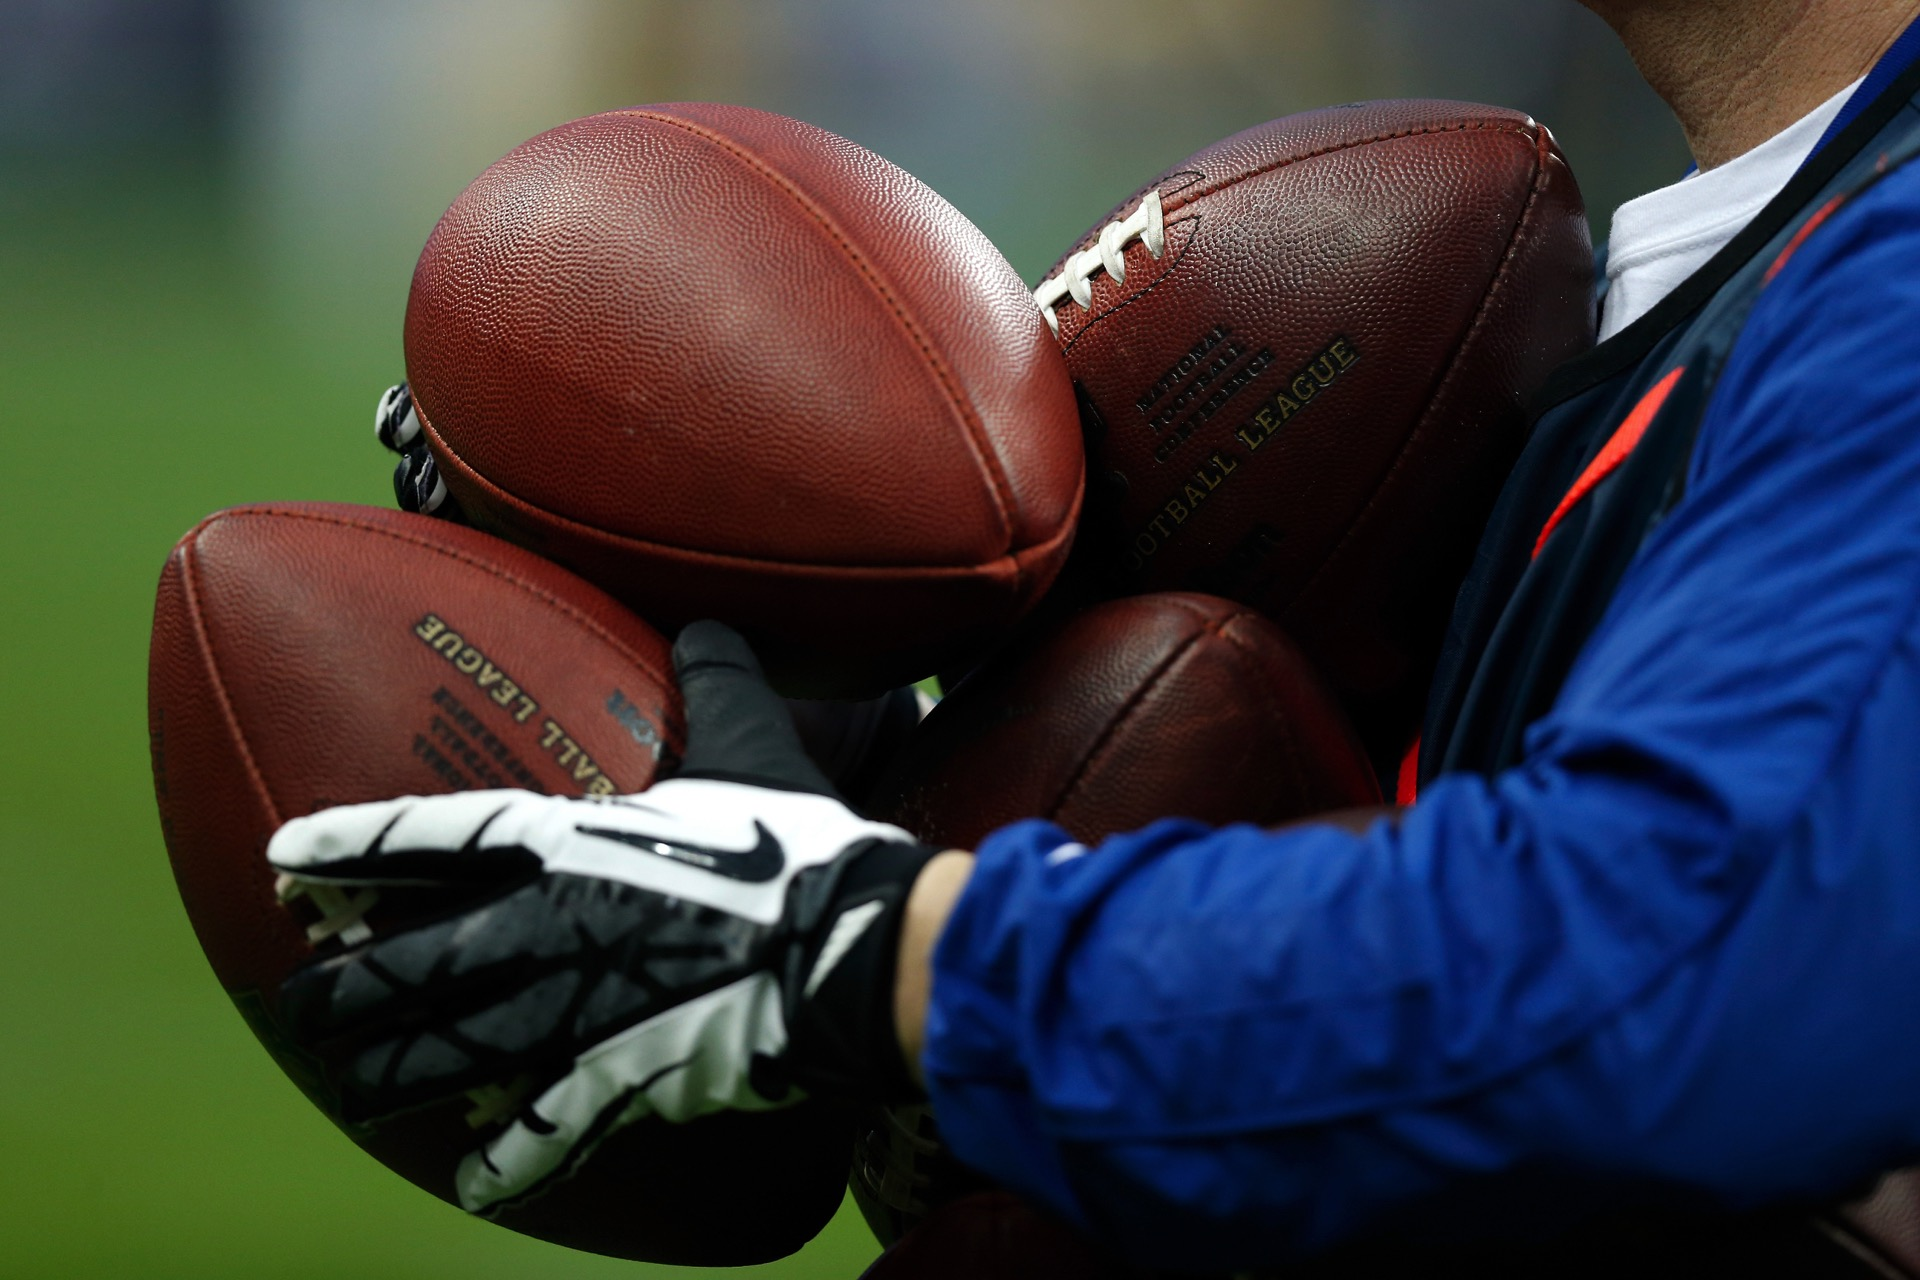 nfl-footballs-120615-usnews-getty-ftr